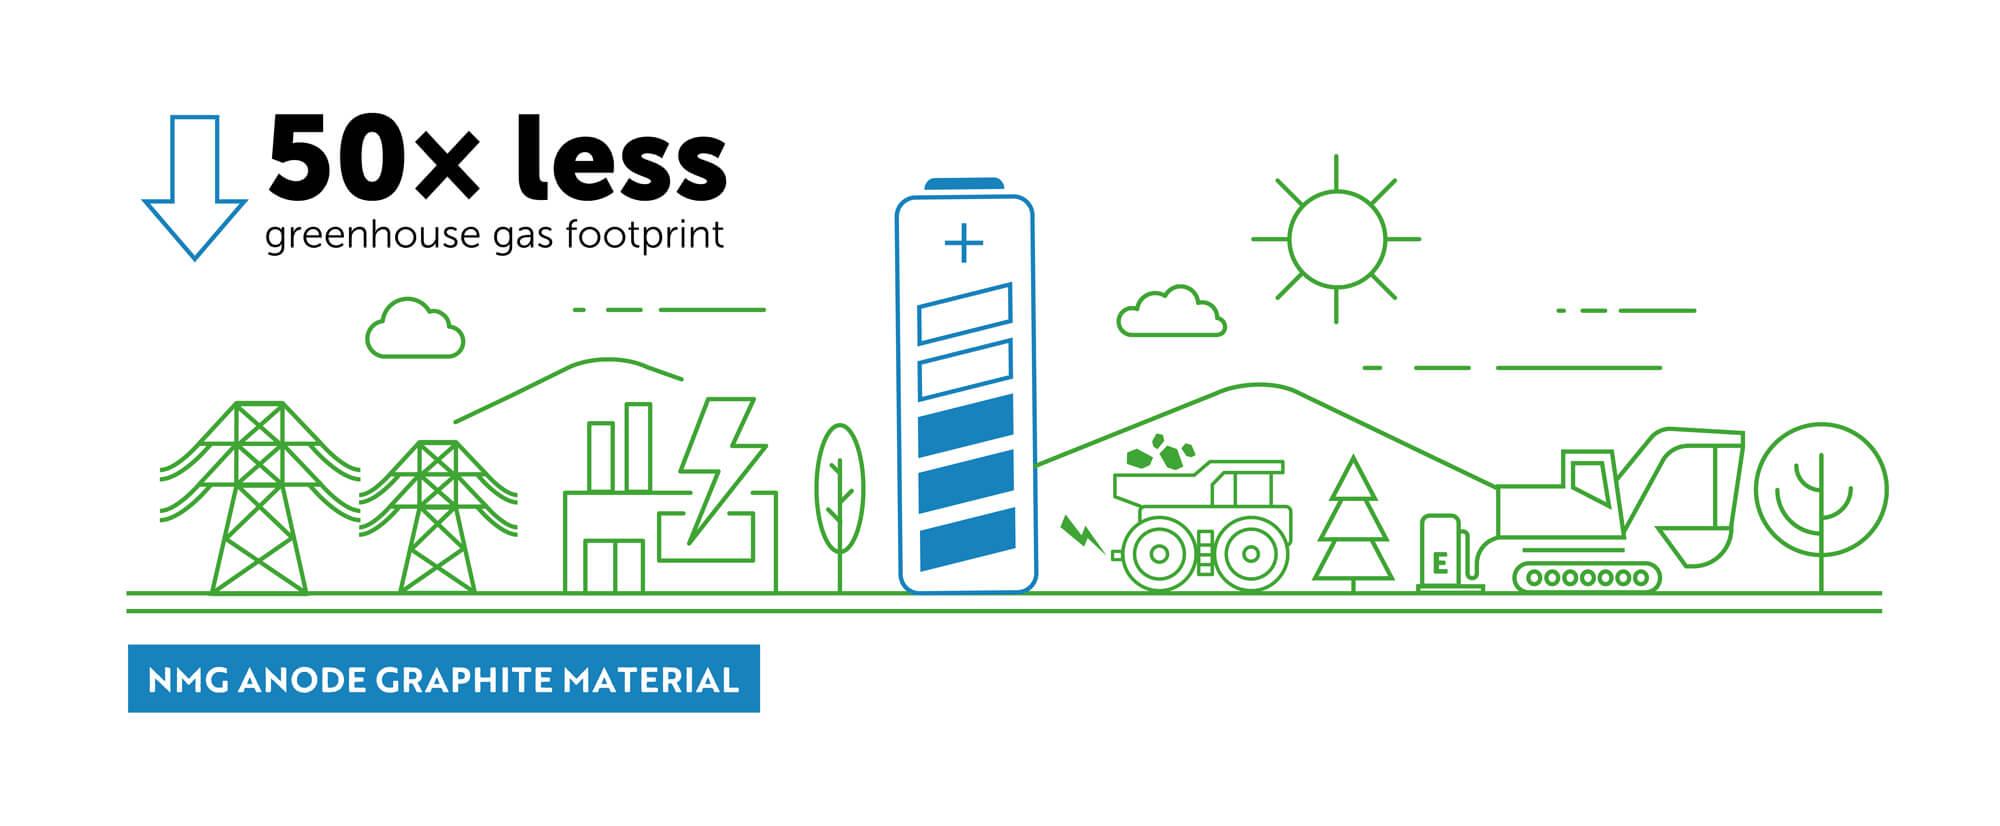 Illustration showing greenhouse gas savings